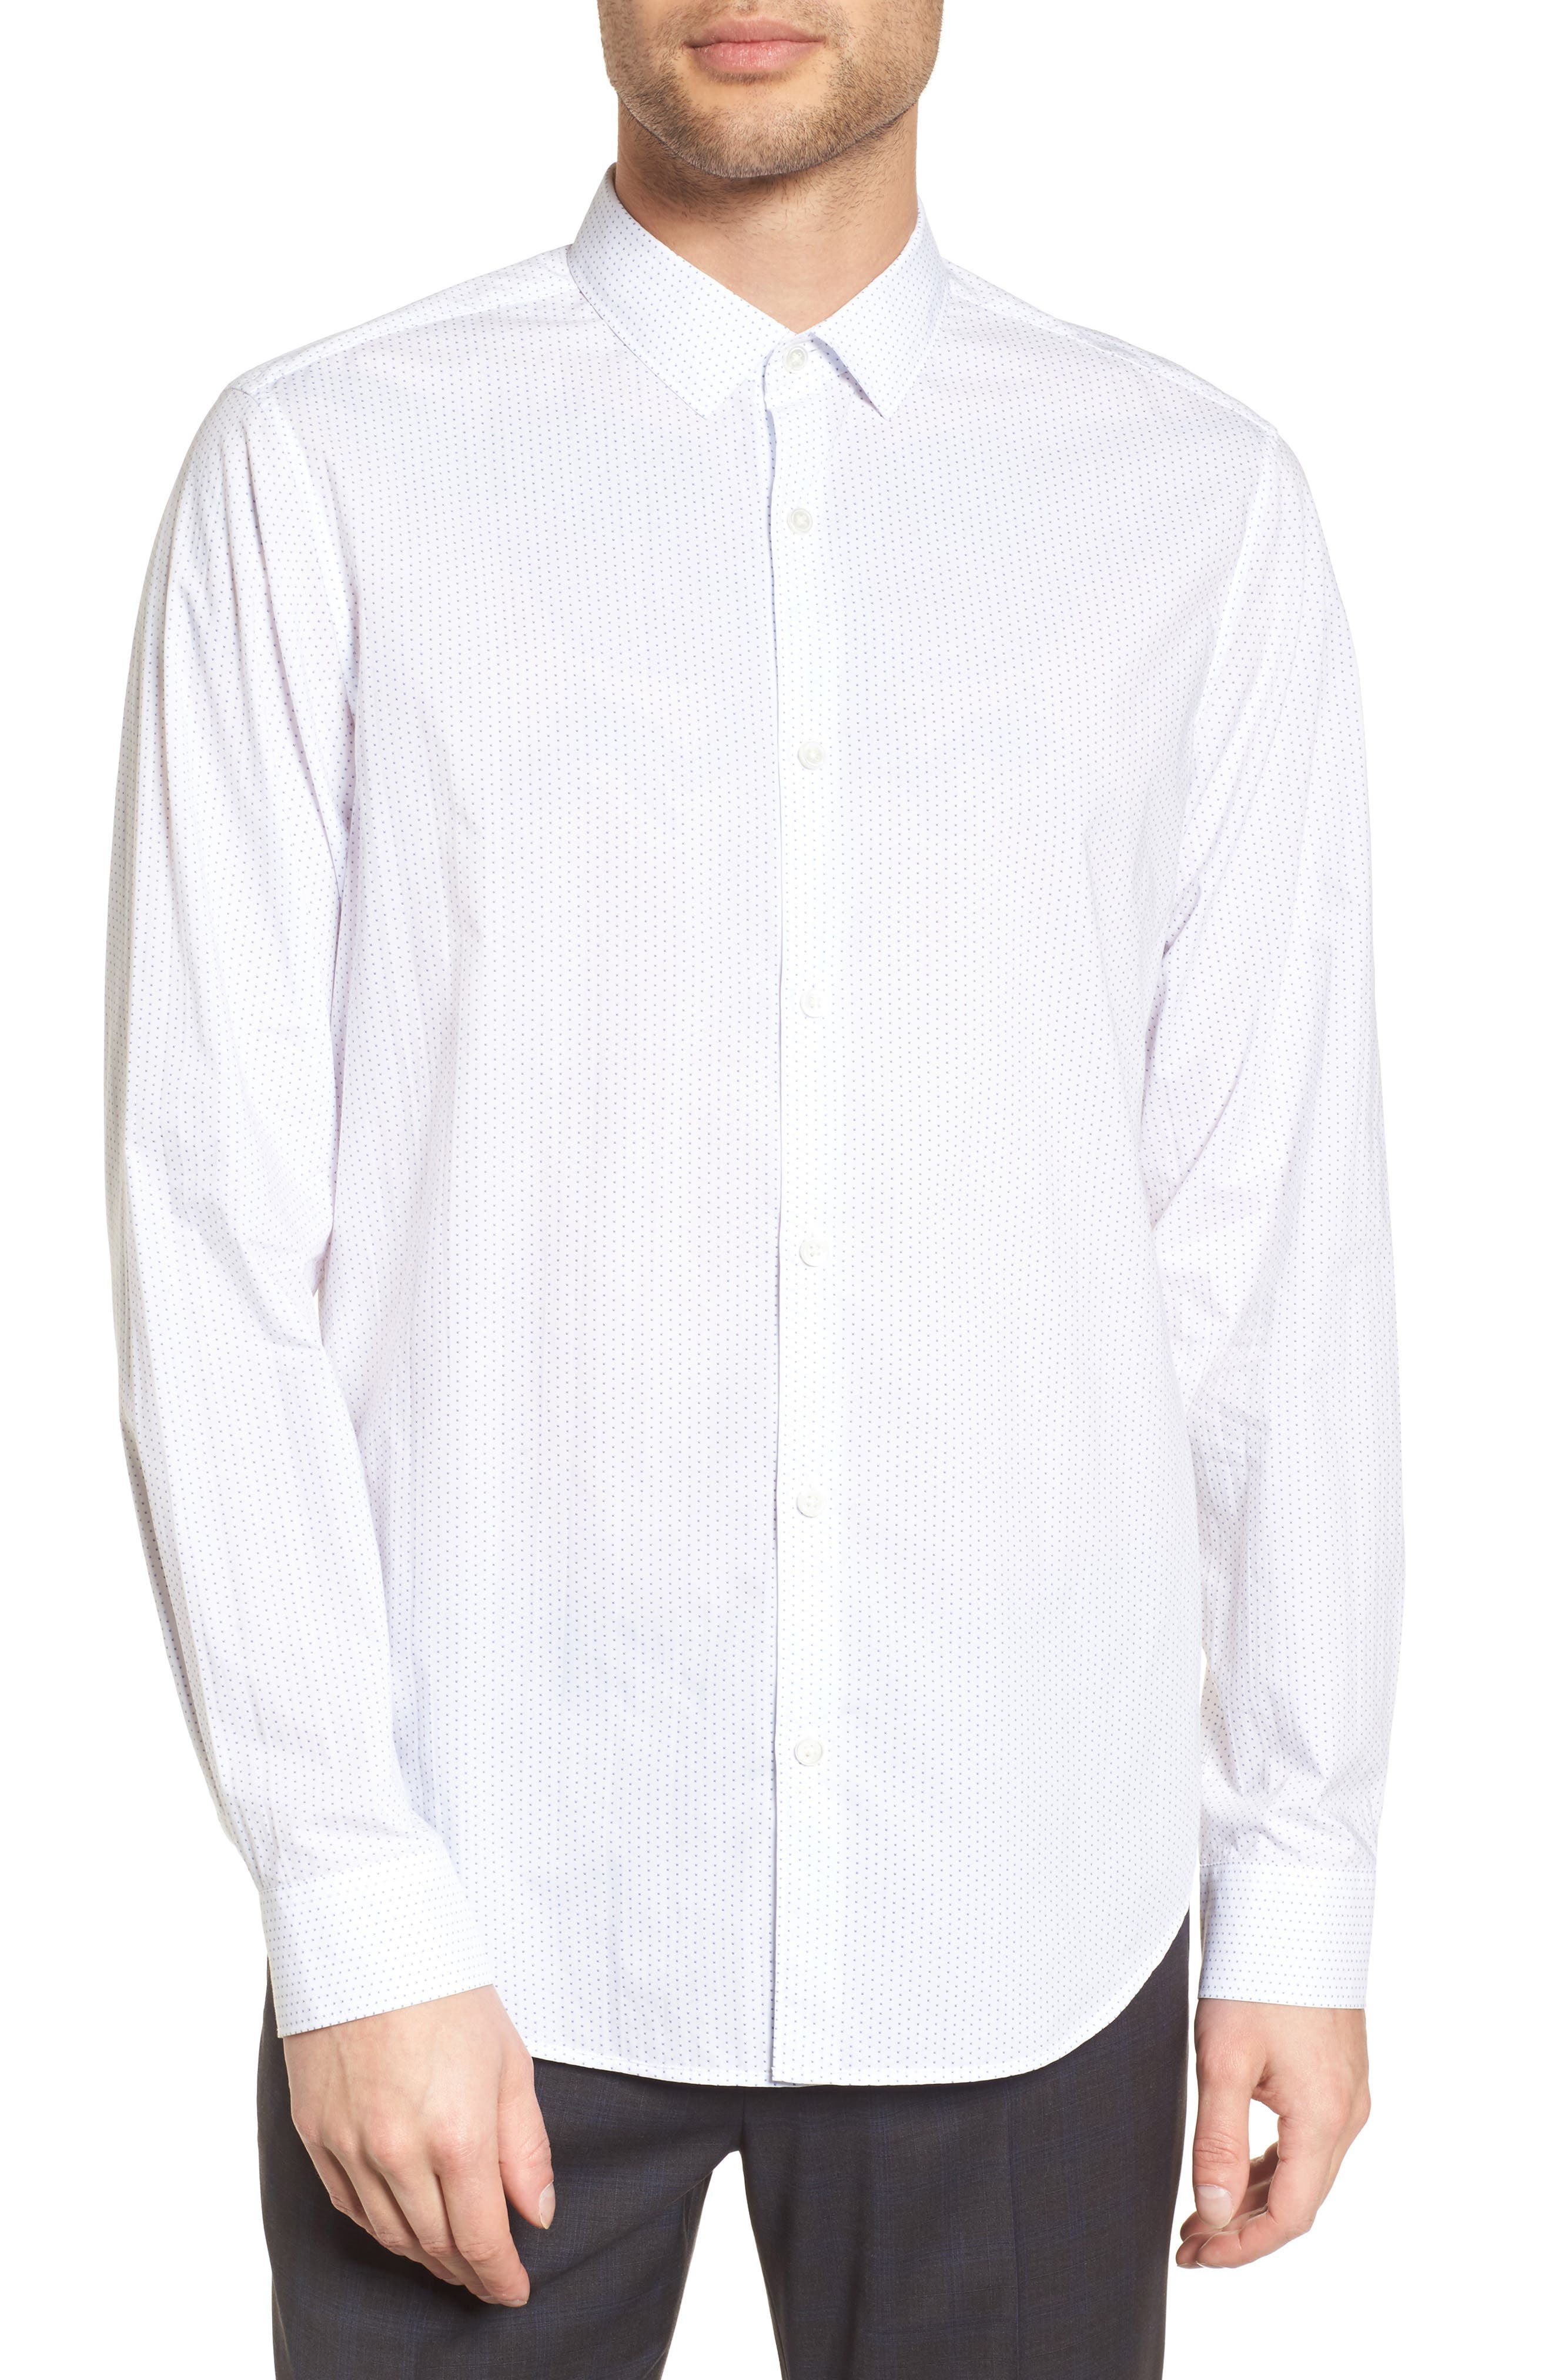 Murray Slim Fit Sport Shirt,                             Main thumbnail 1, color,                             100